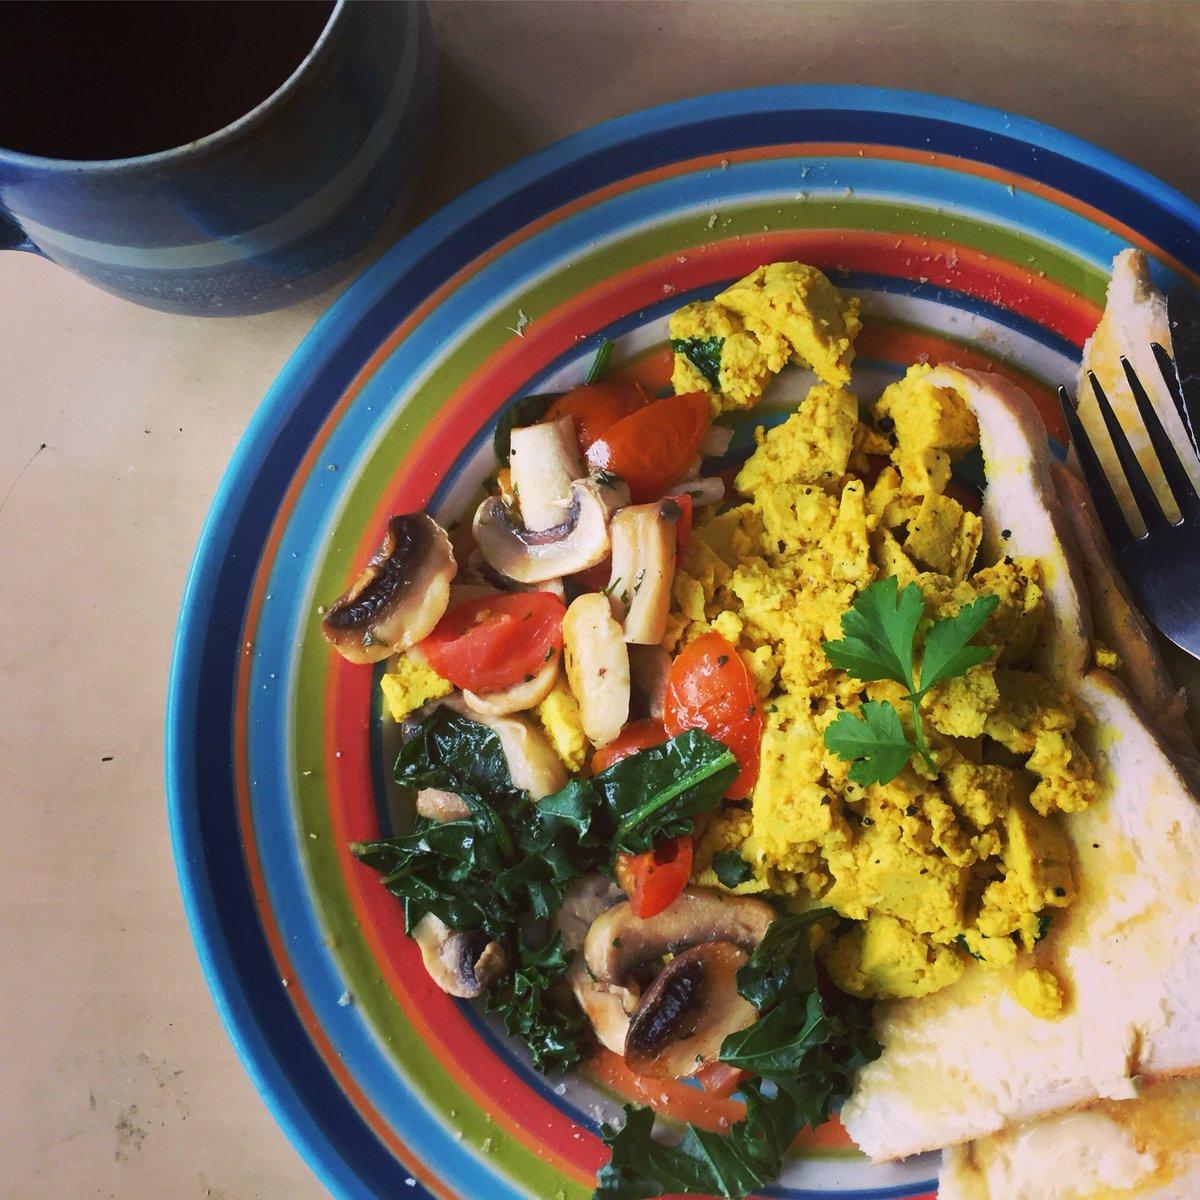 Tasty breakfast ❤️  (Scrambled tofu)   #veganfood https://t.co/pnDpWaa49A